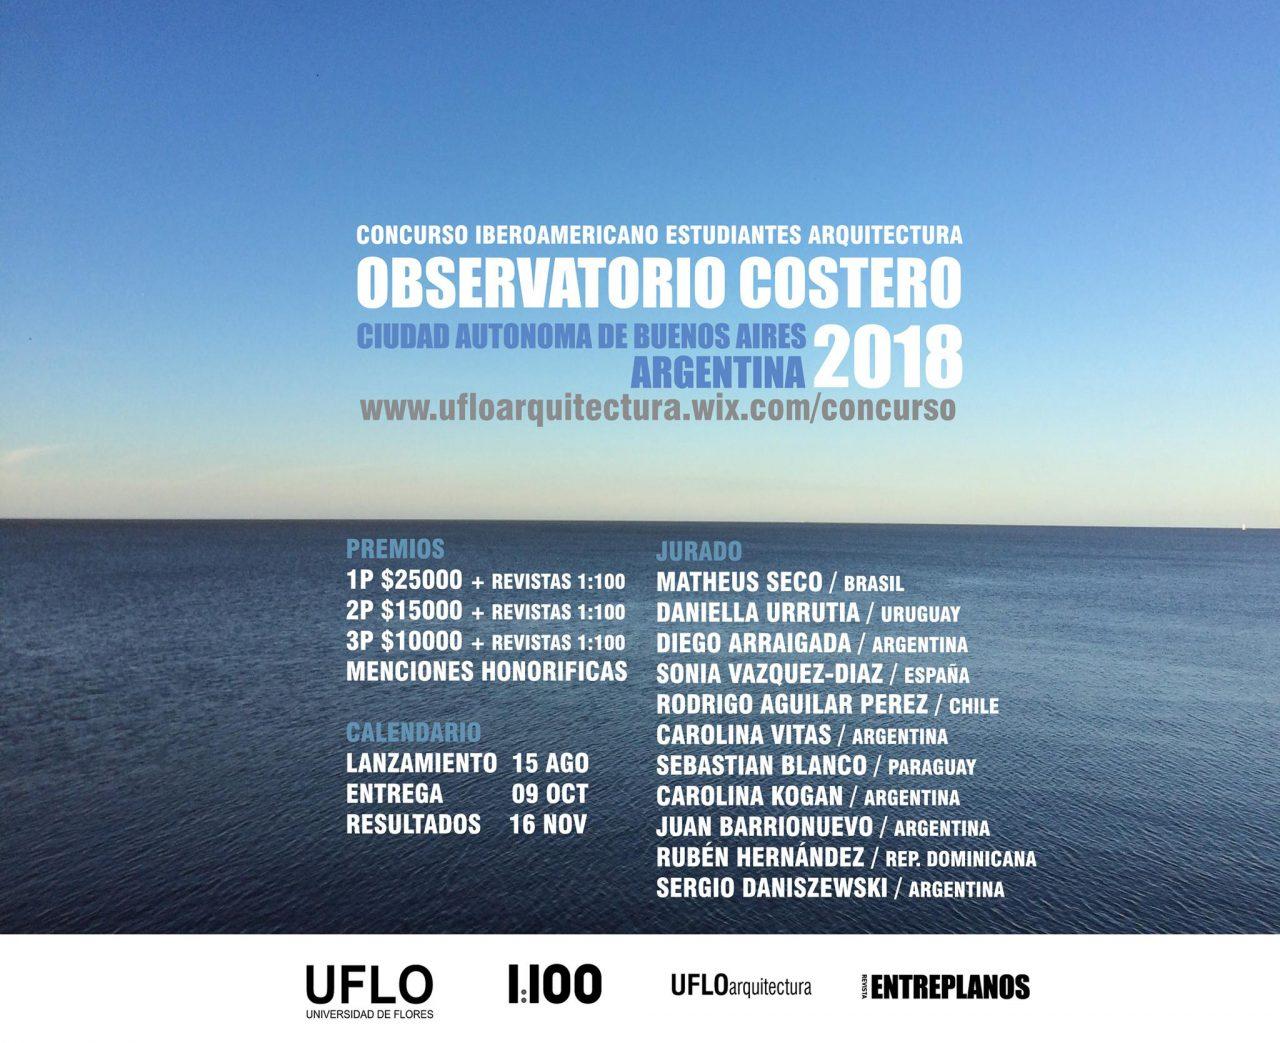 uflo-concurso-arquitectura-1280x1043.jpg